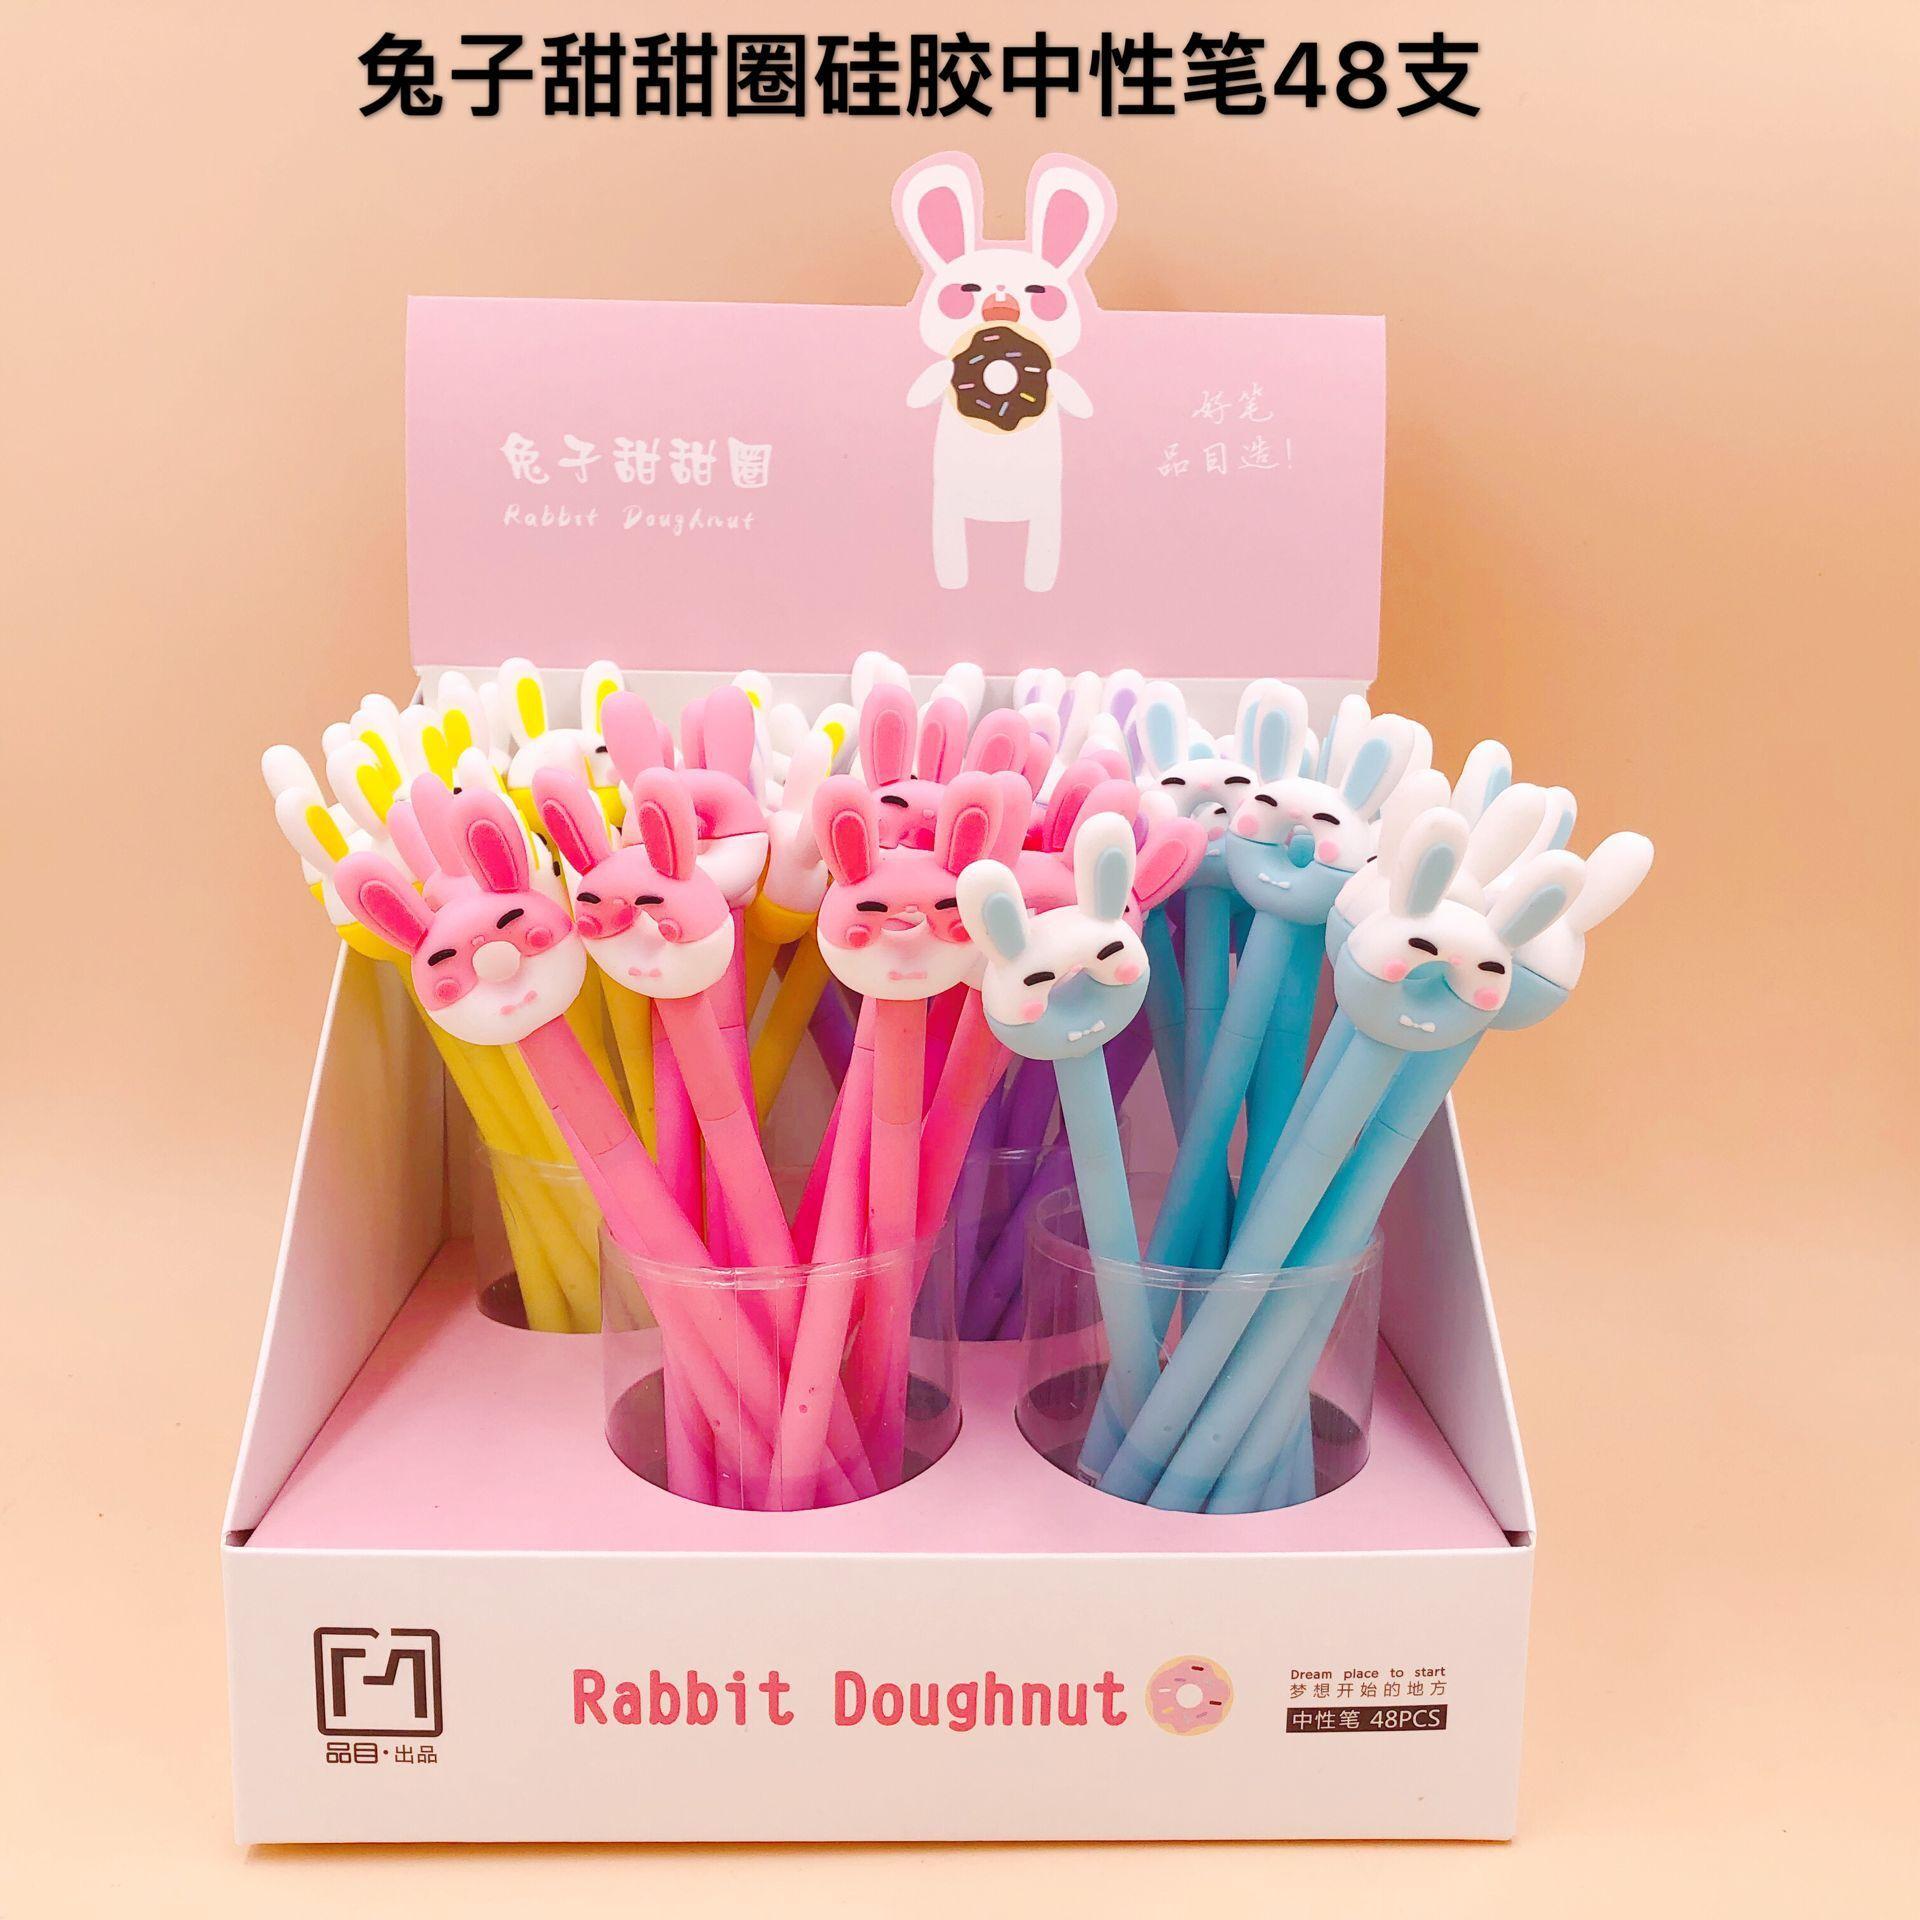 48pcs Writing Pen Black Gel Ink Pen Cartoon Rabbit Donut Pen for Writing Cute Stationery Kawaii Office School Supplies 0.5mm